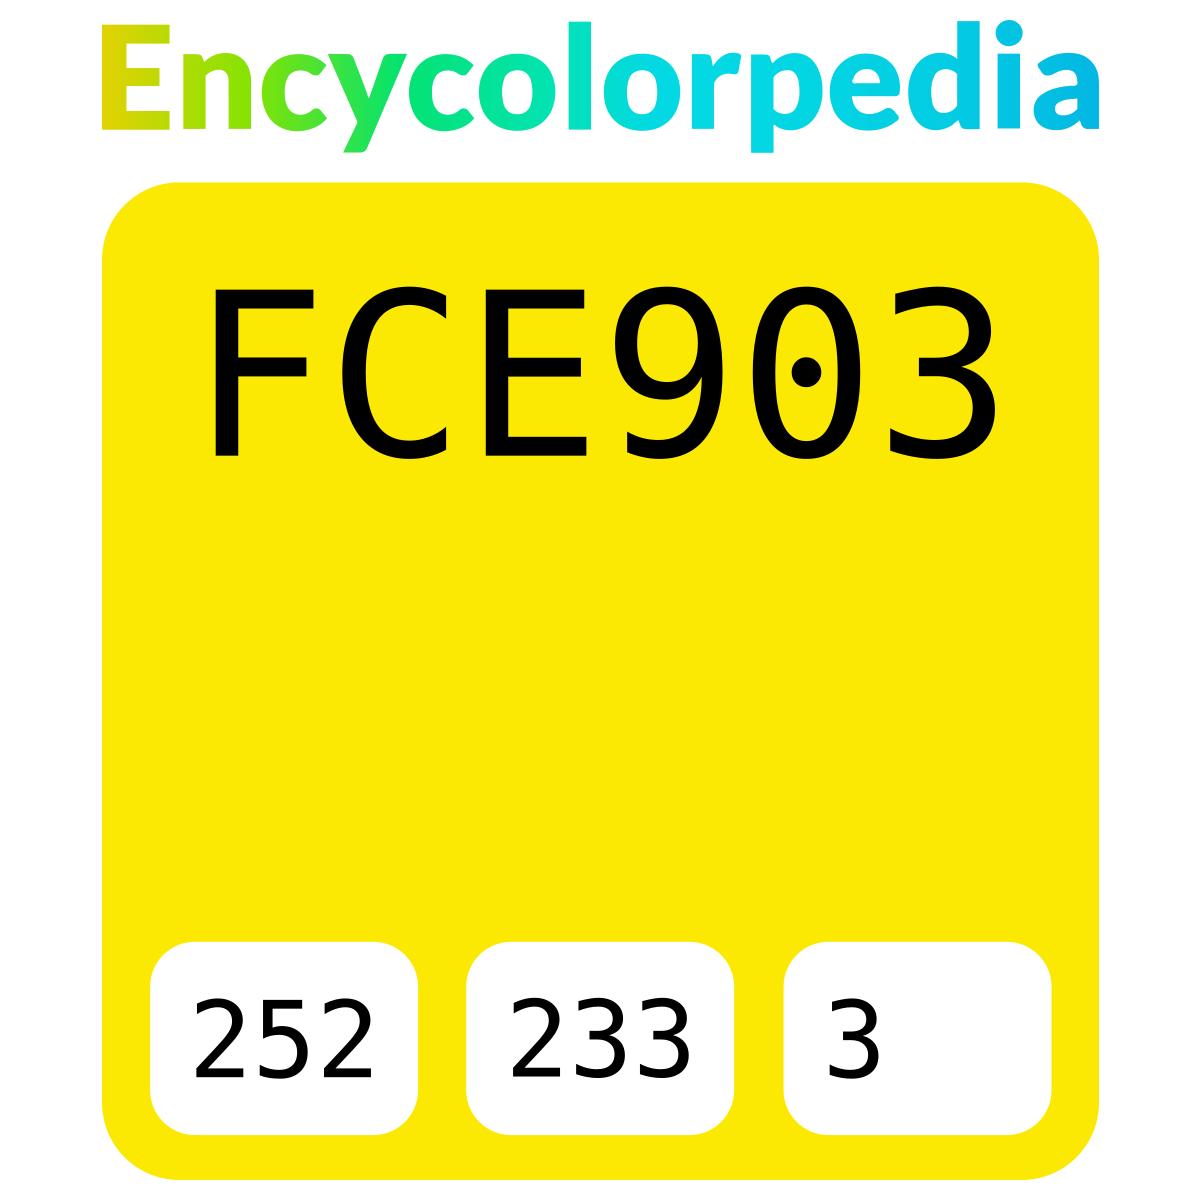 Fce903 Renk Sema Kodlari Ve Boyalar